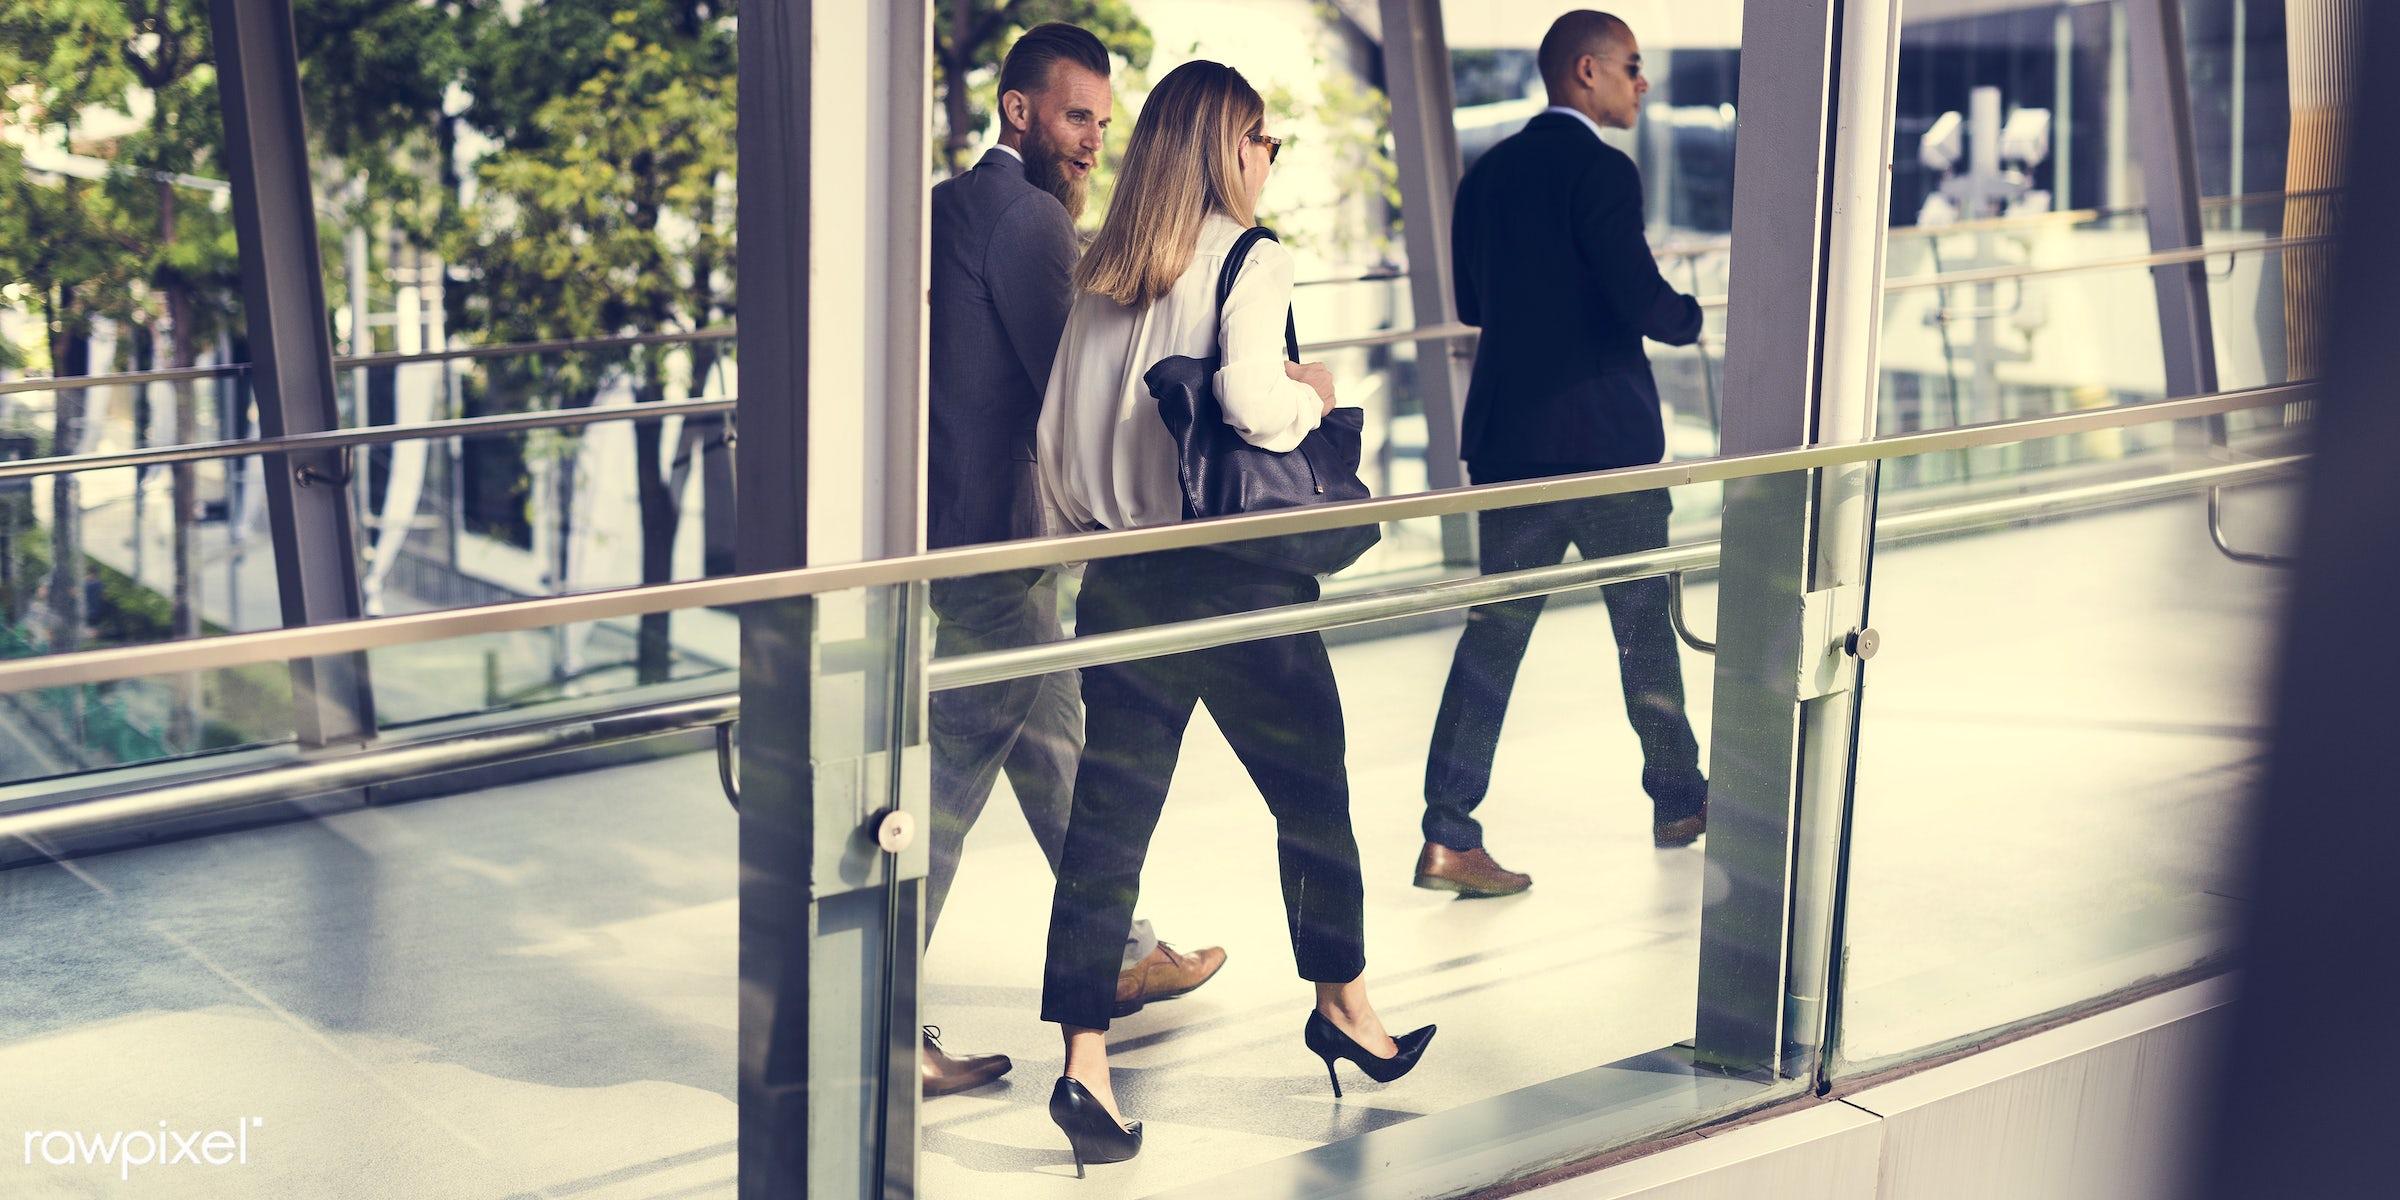 person, suit and tie, white collar worker, people, business, caucasian, break, friends, businesswomen, hands, woman,...